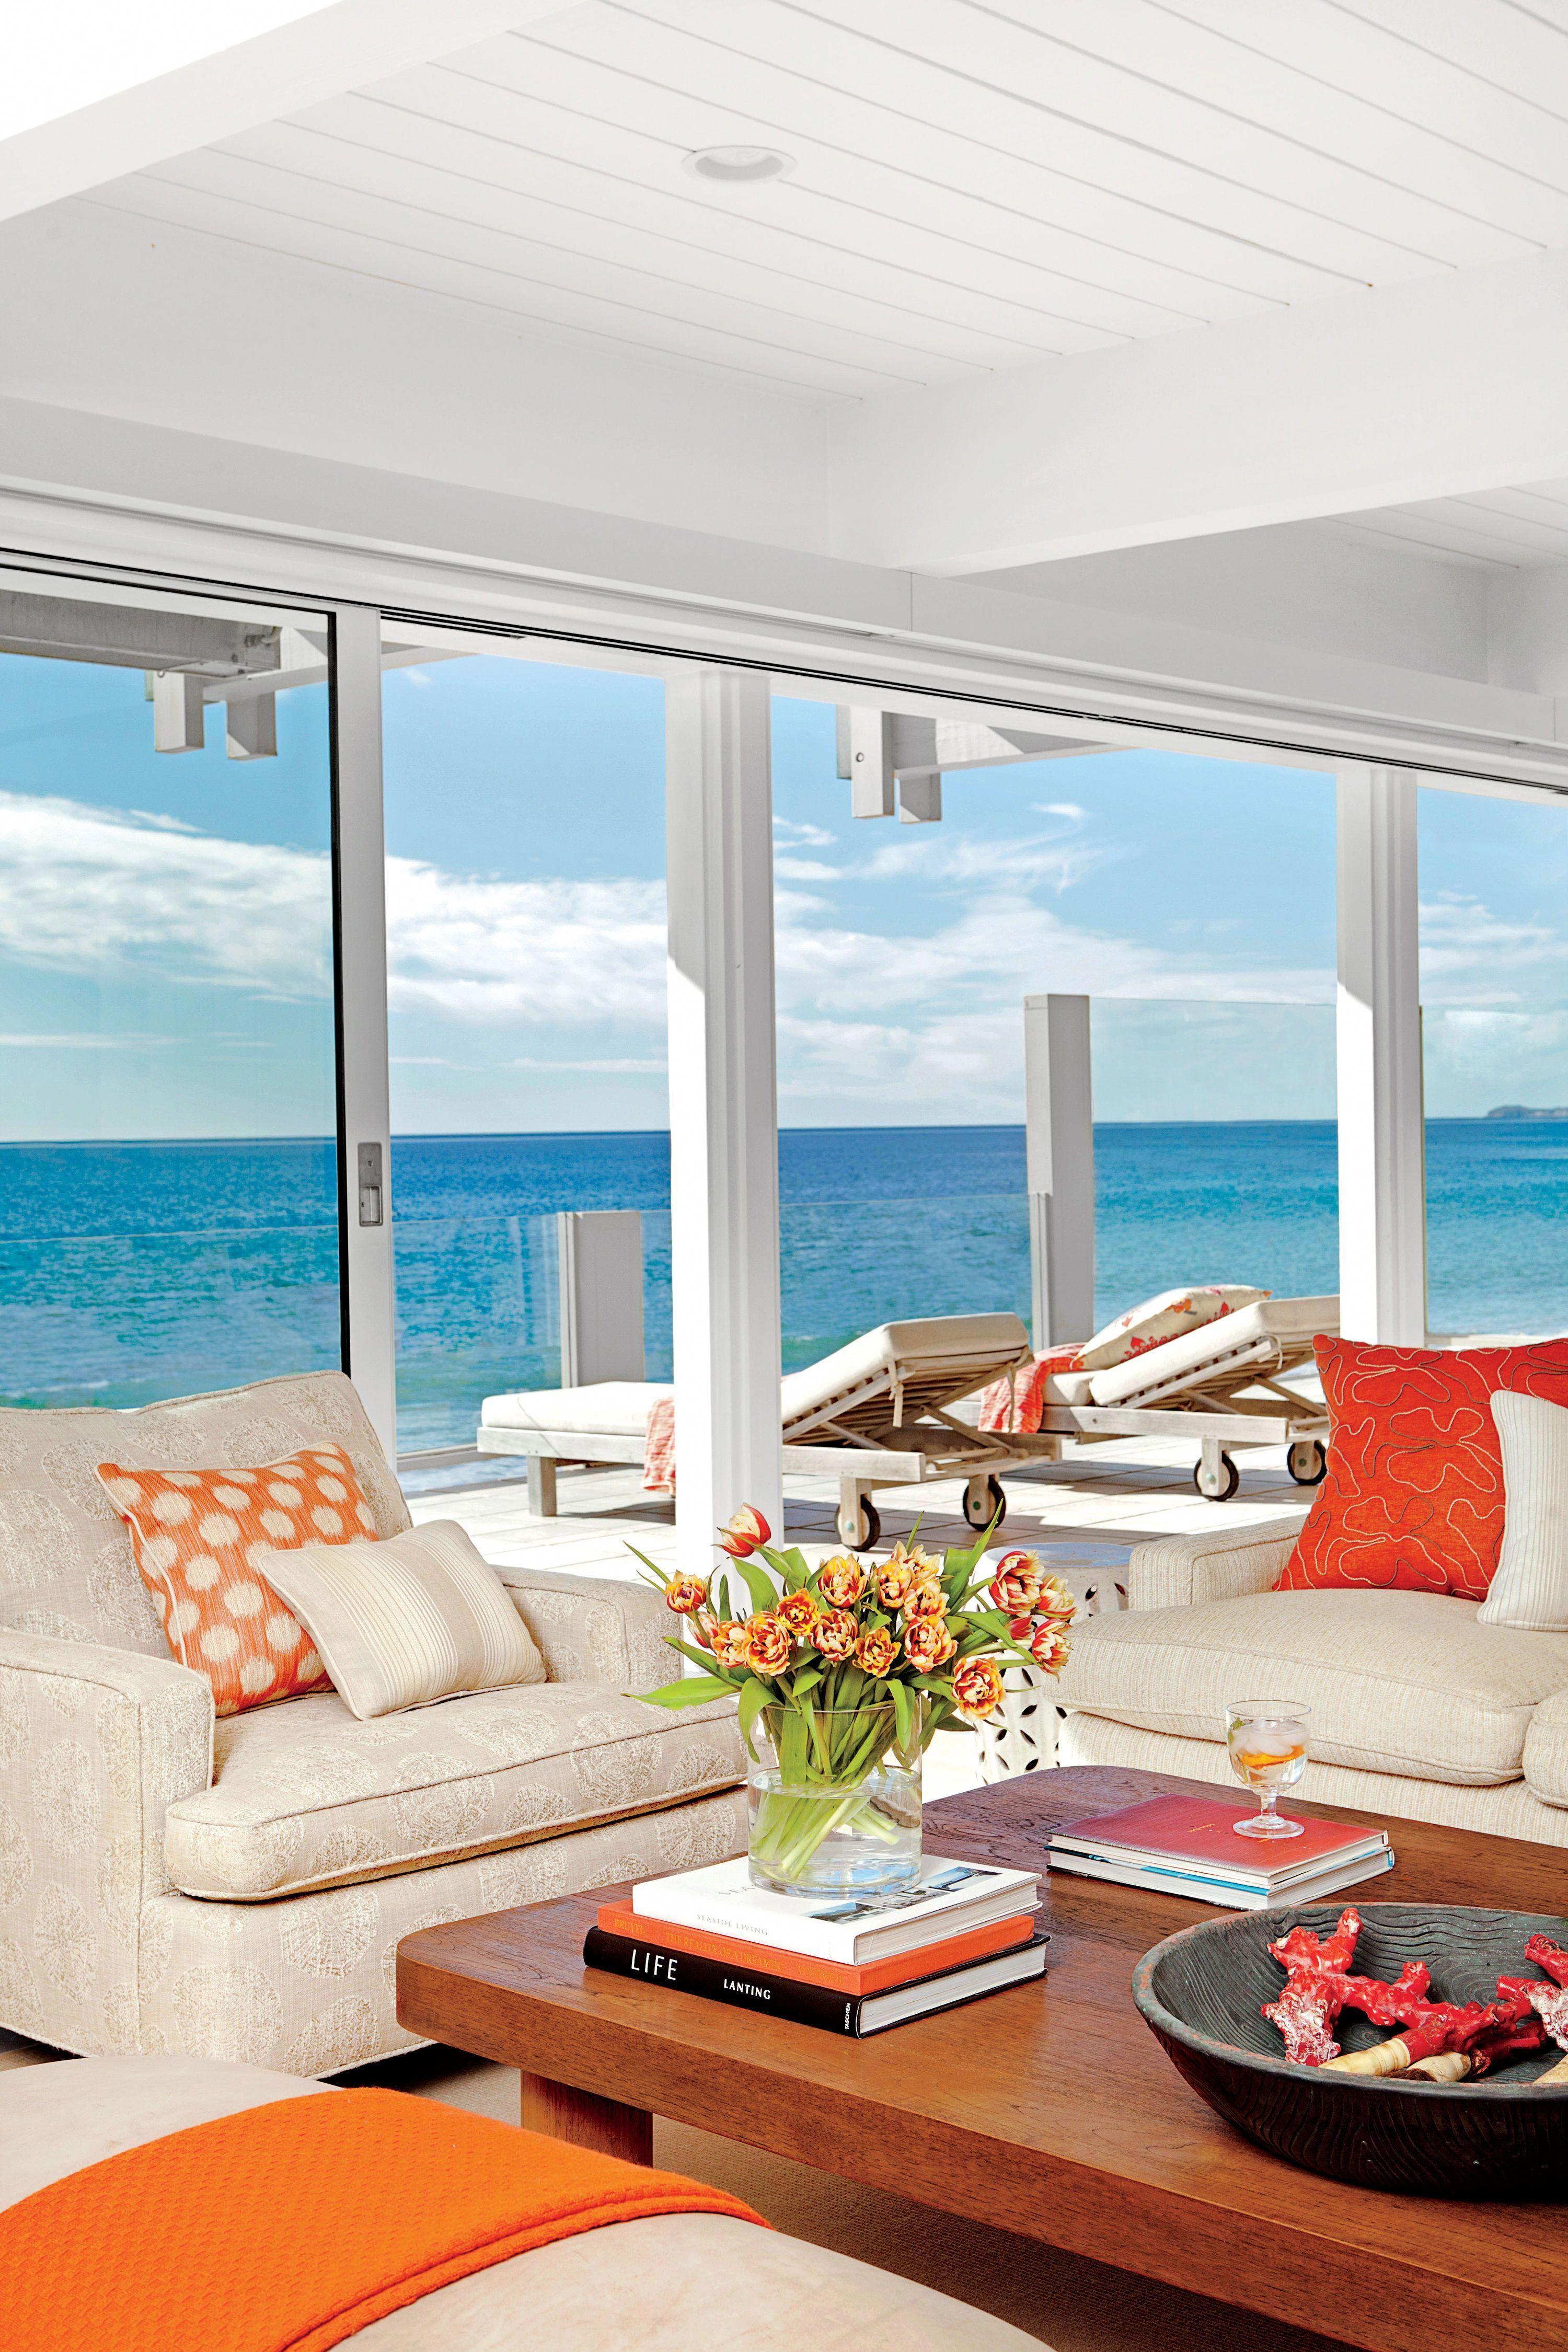 Home Decor Ideas Beach Theme International Magazines